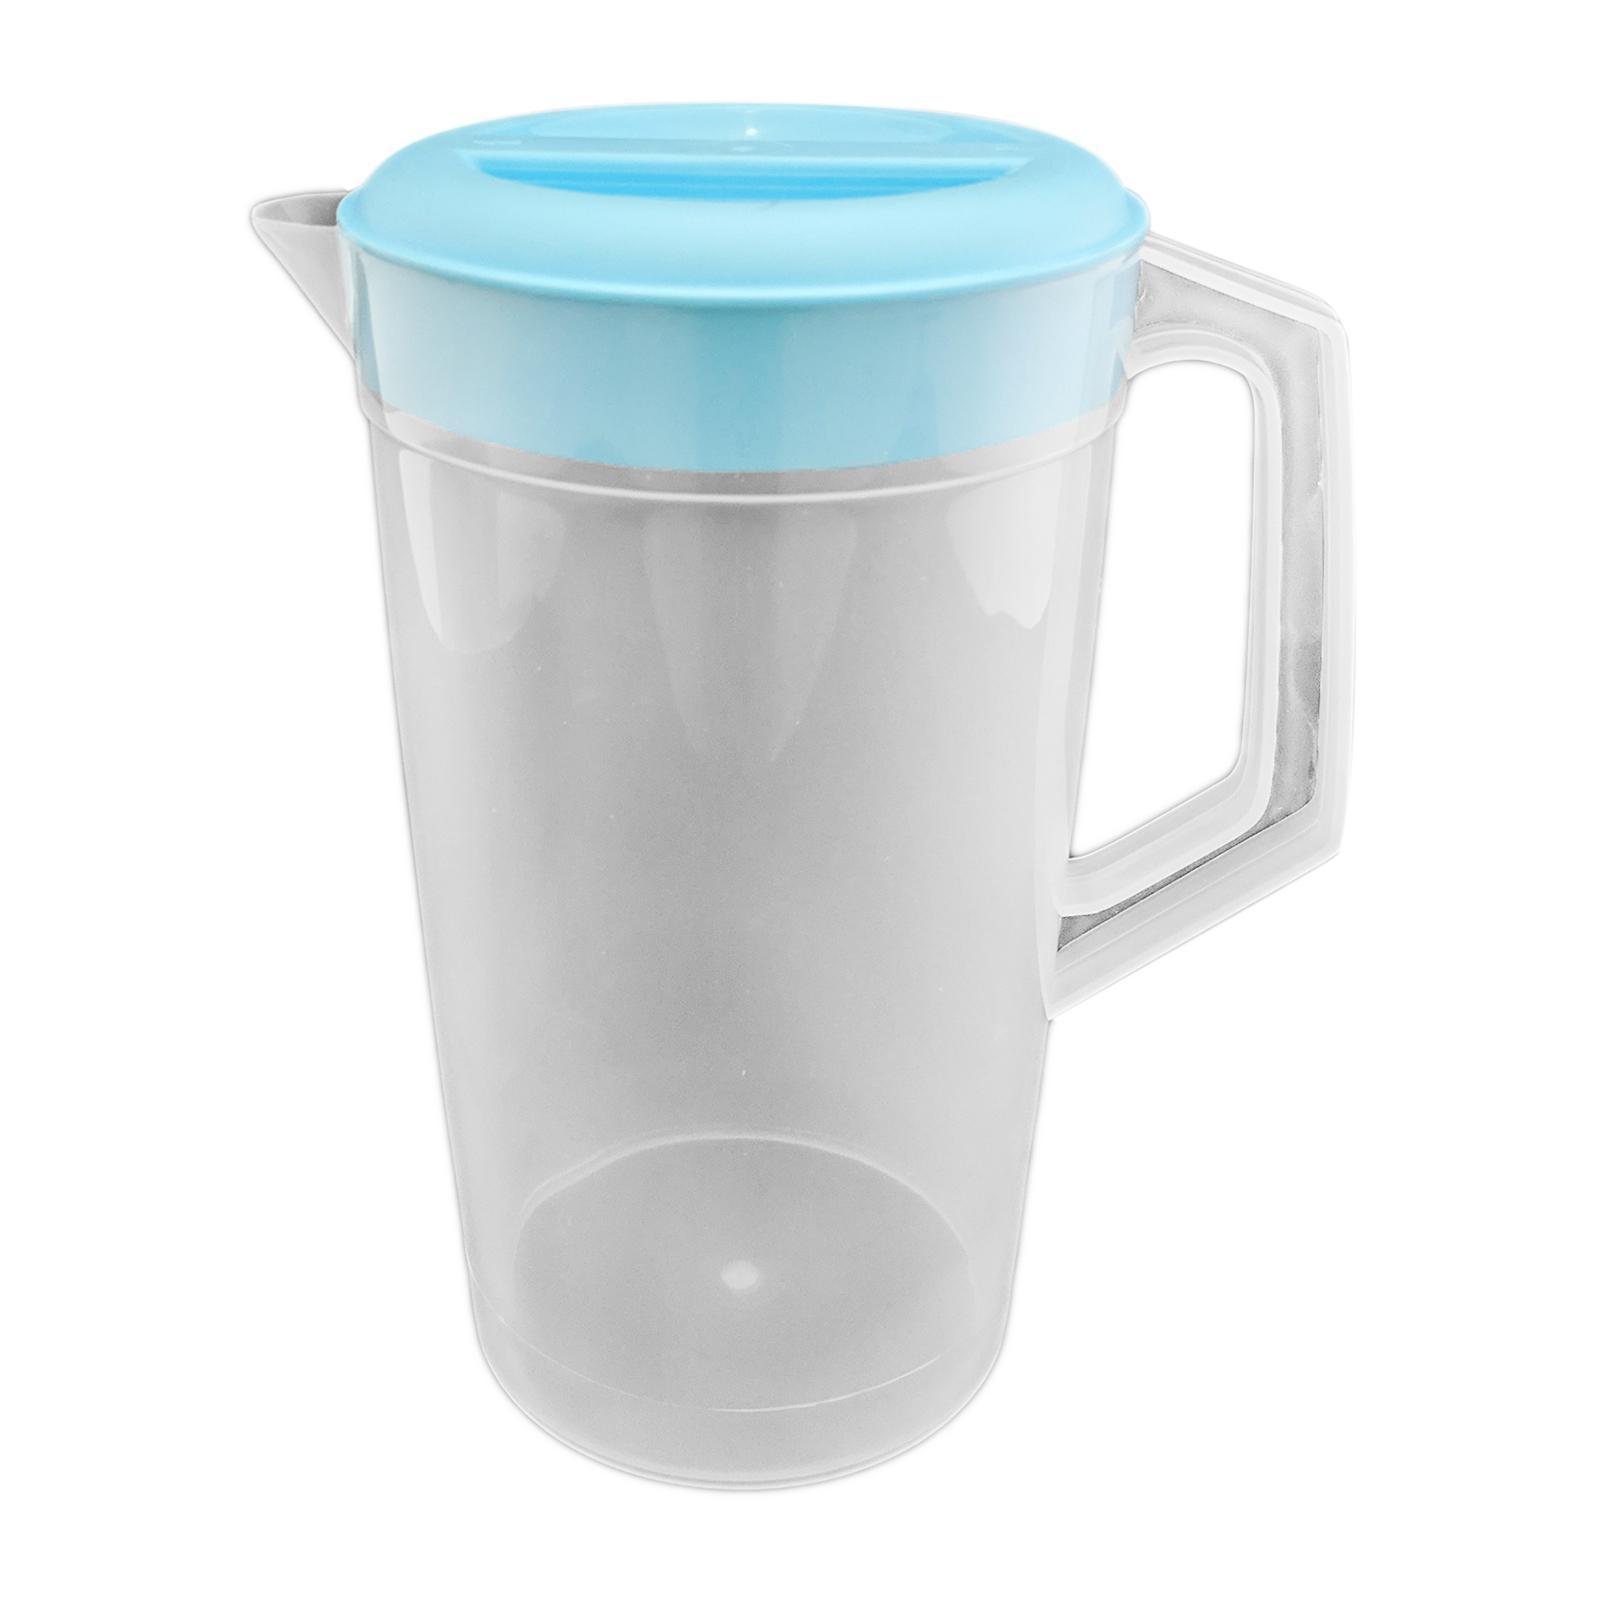 Sitbo Plastic Juice And Water Jug 2 L (Blue)